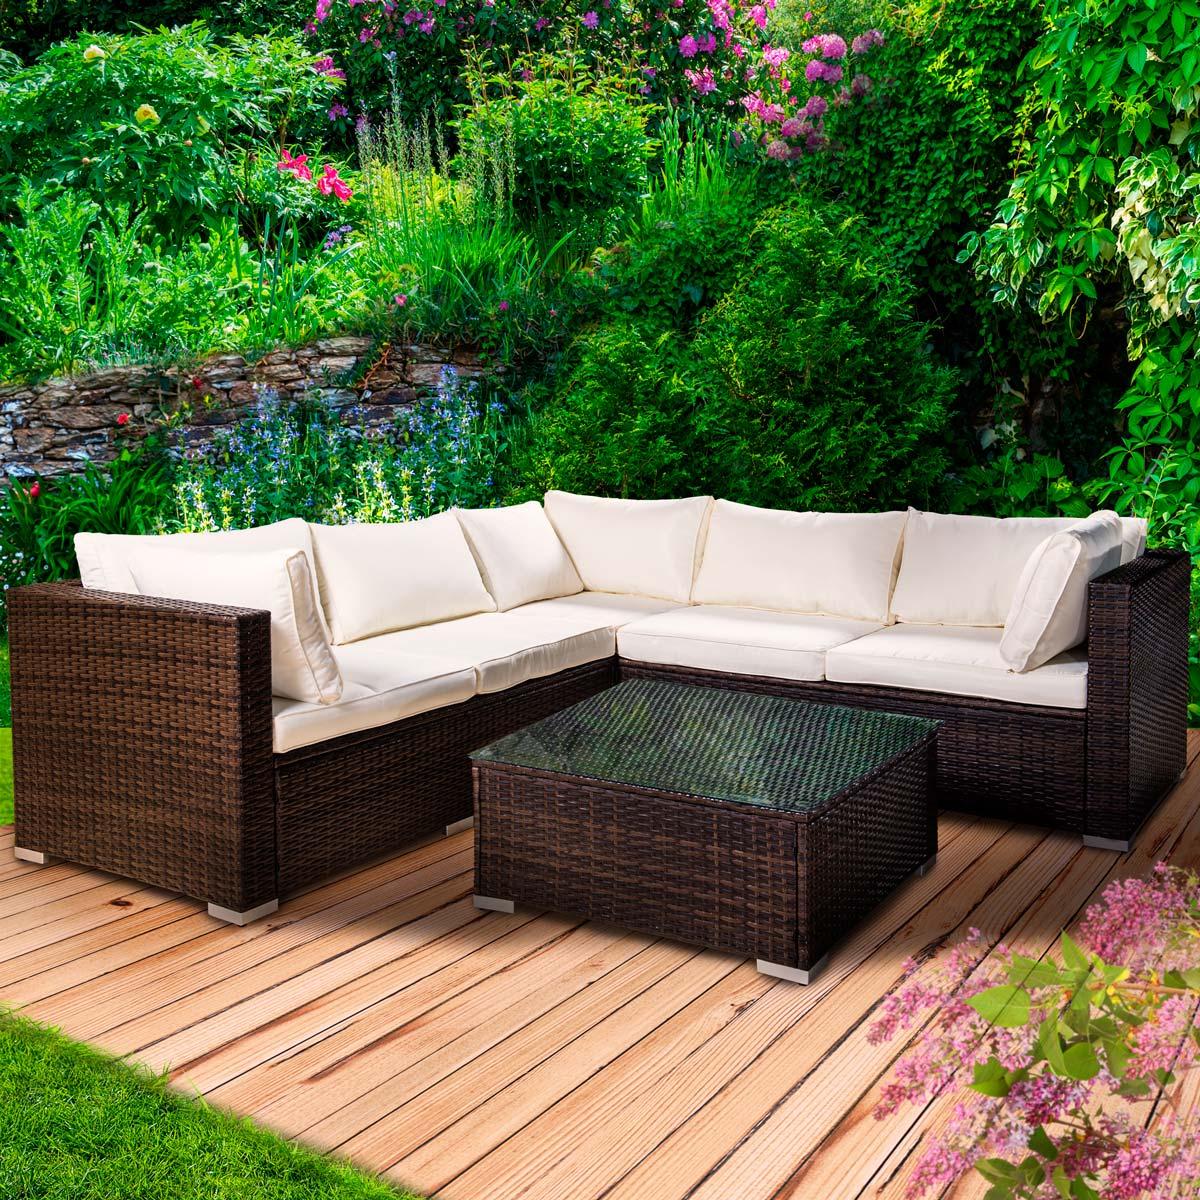 Polyrattan Lounge Sitzgruppe Sitzgarnitur Sofa Gartenmöbel Eck